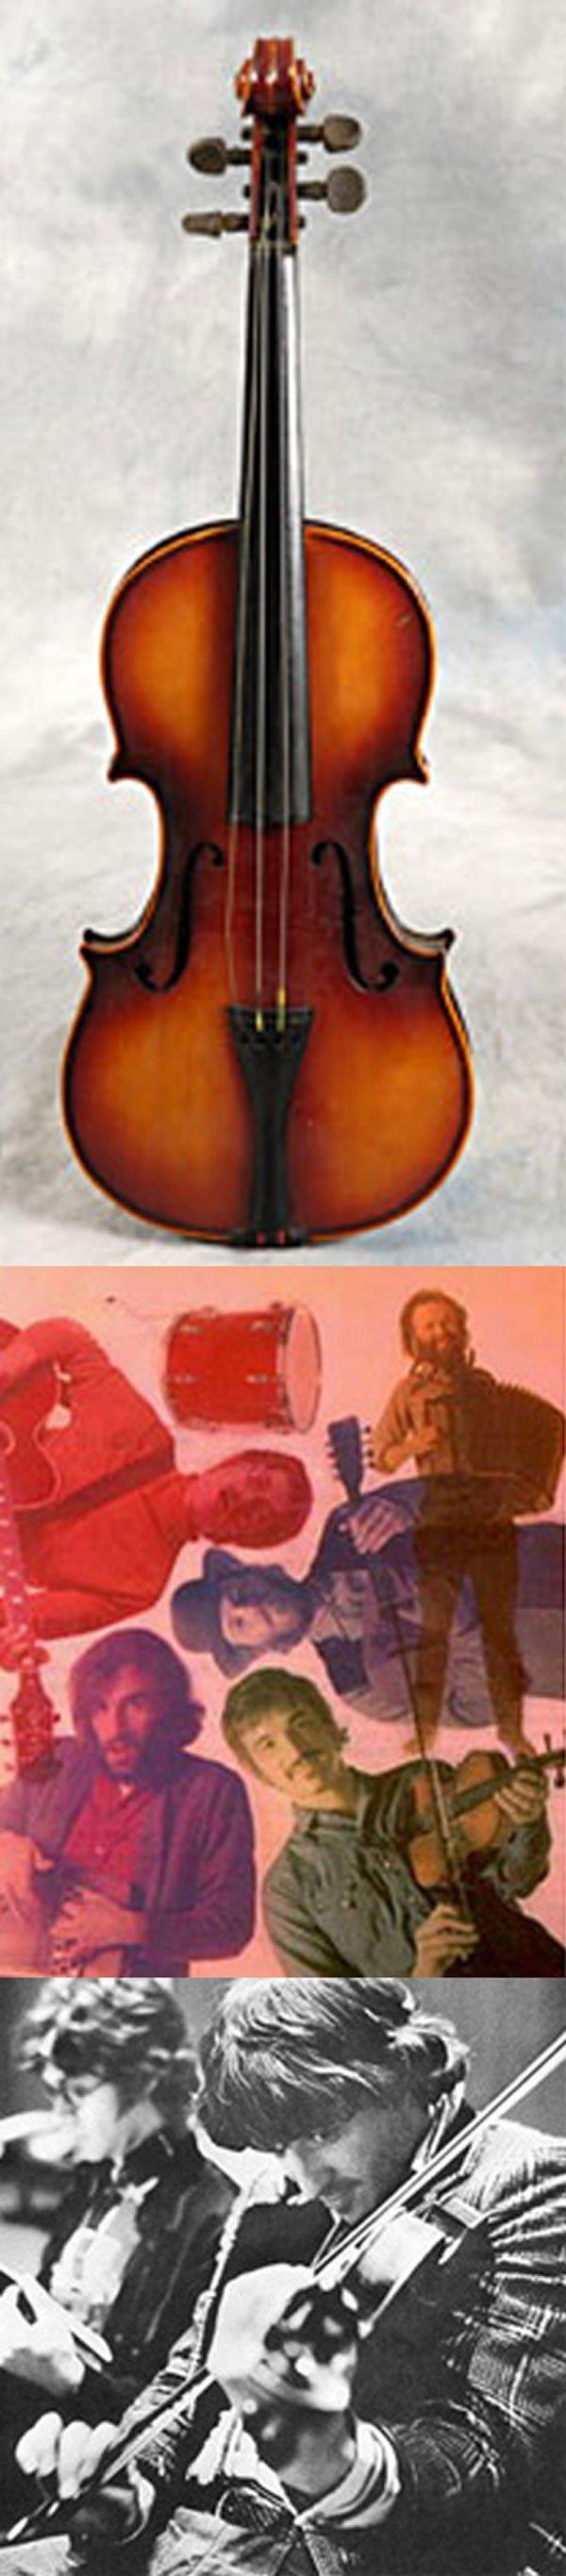 18 -Rick Danko The Band owned & played Violin